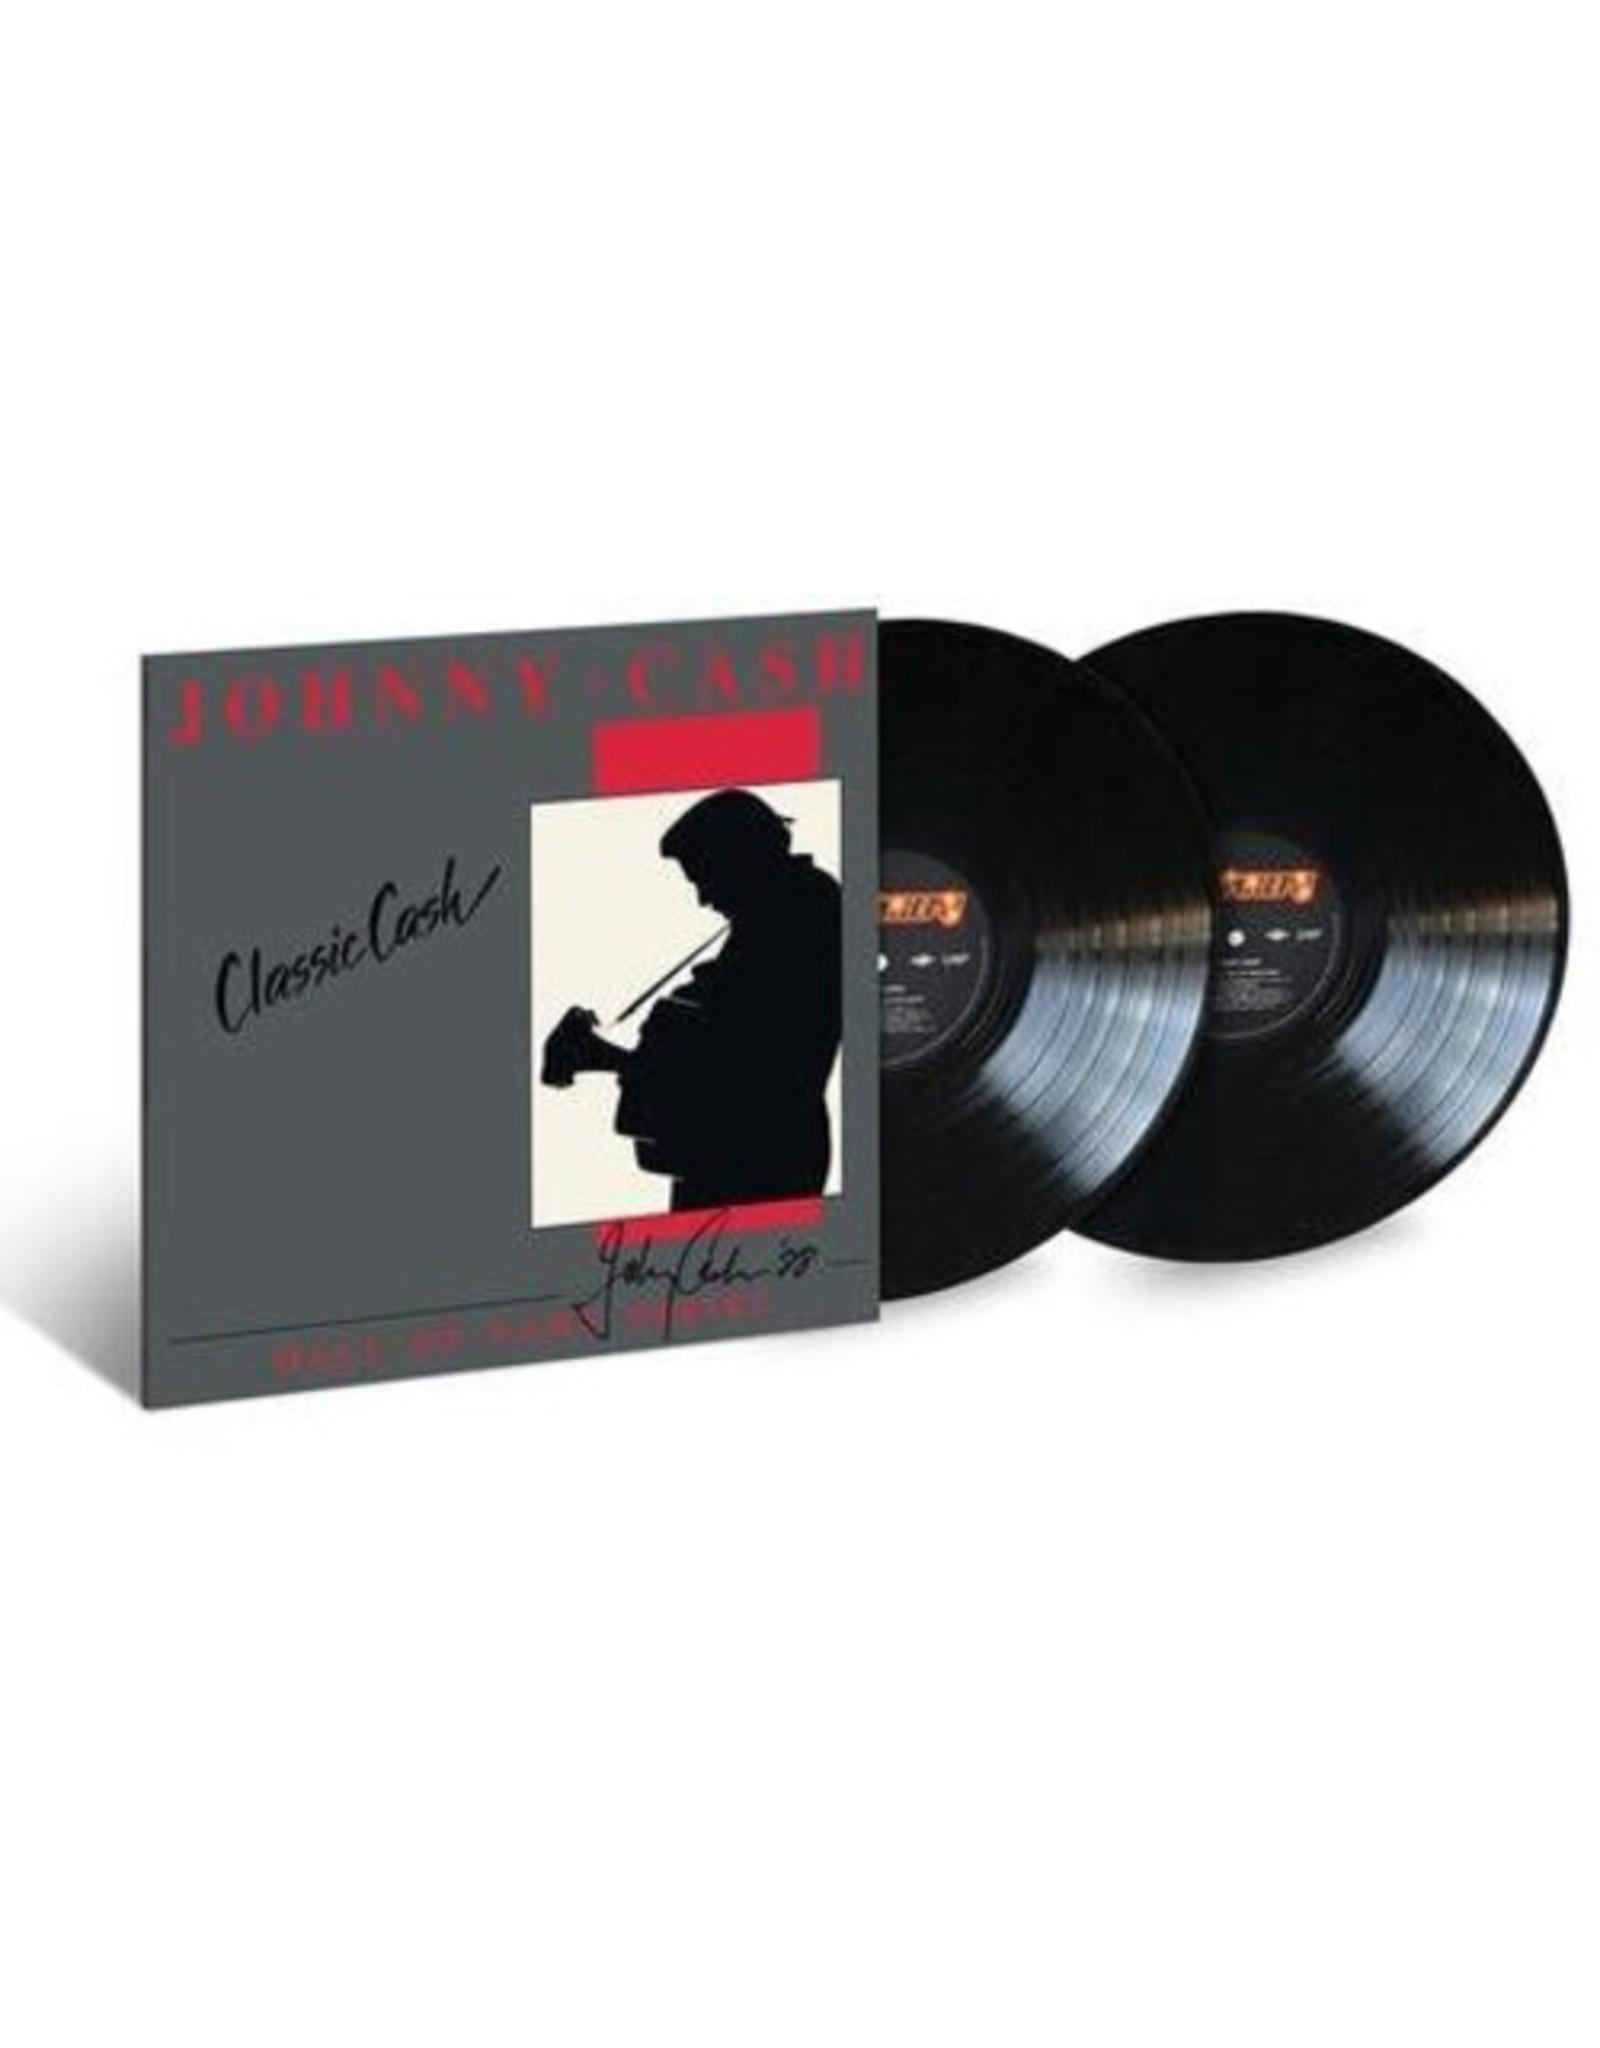 New Vinyl Johnny Cash - Classic Cash: Hall Of Fame Series 2LP